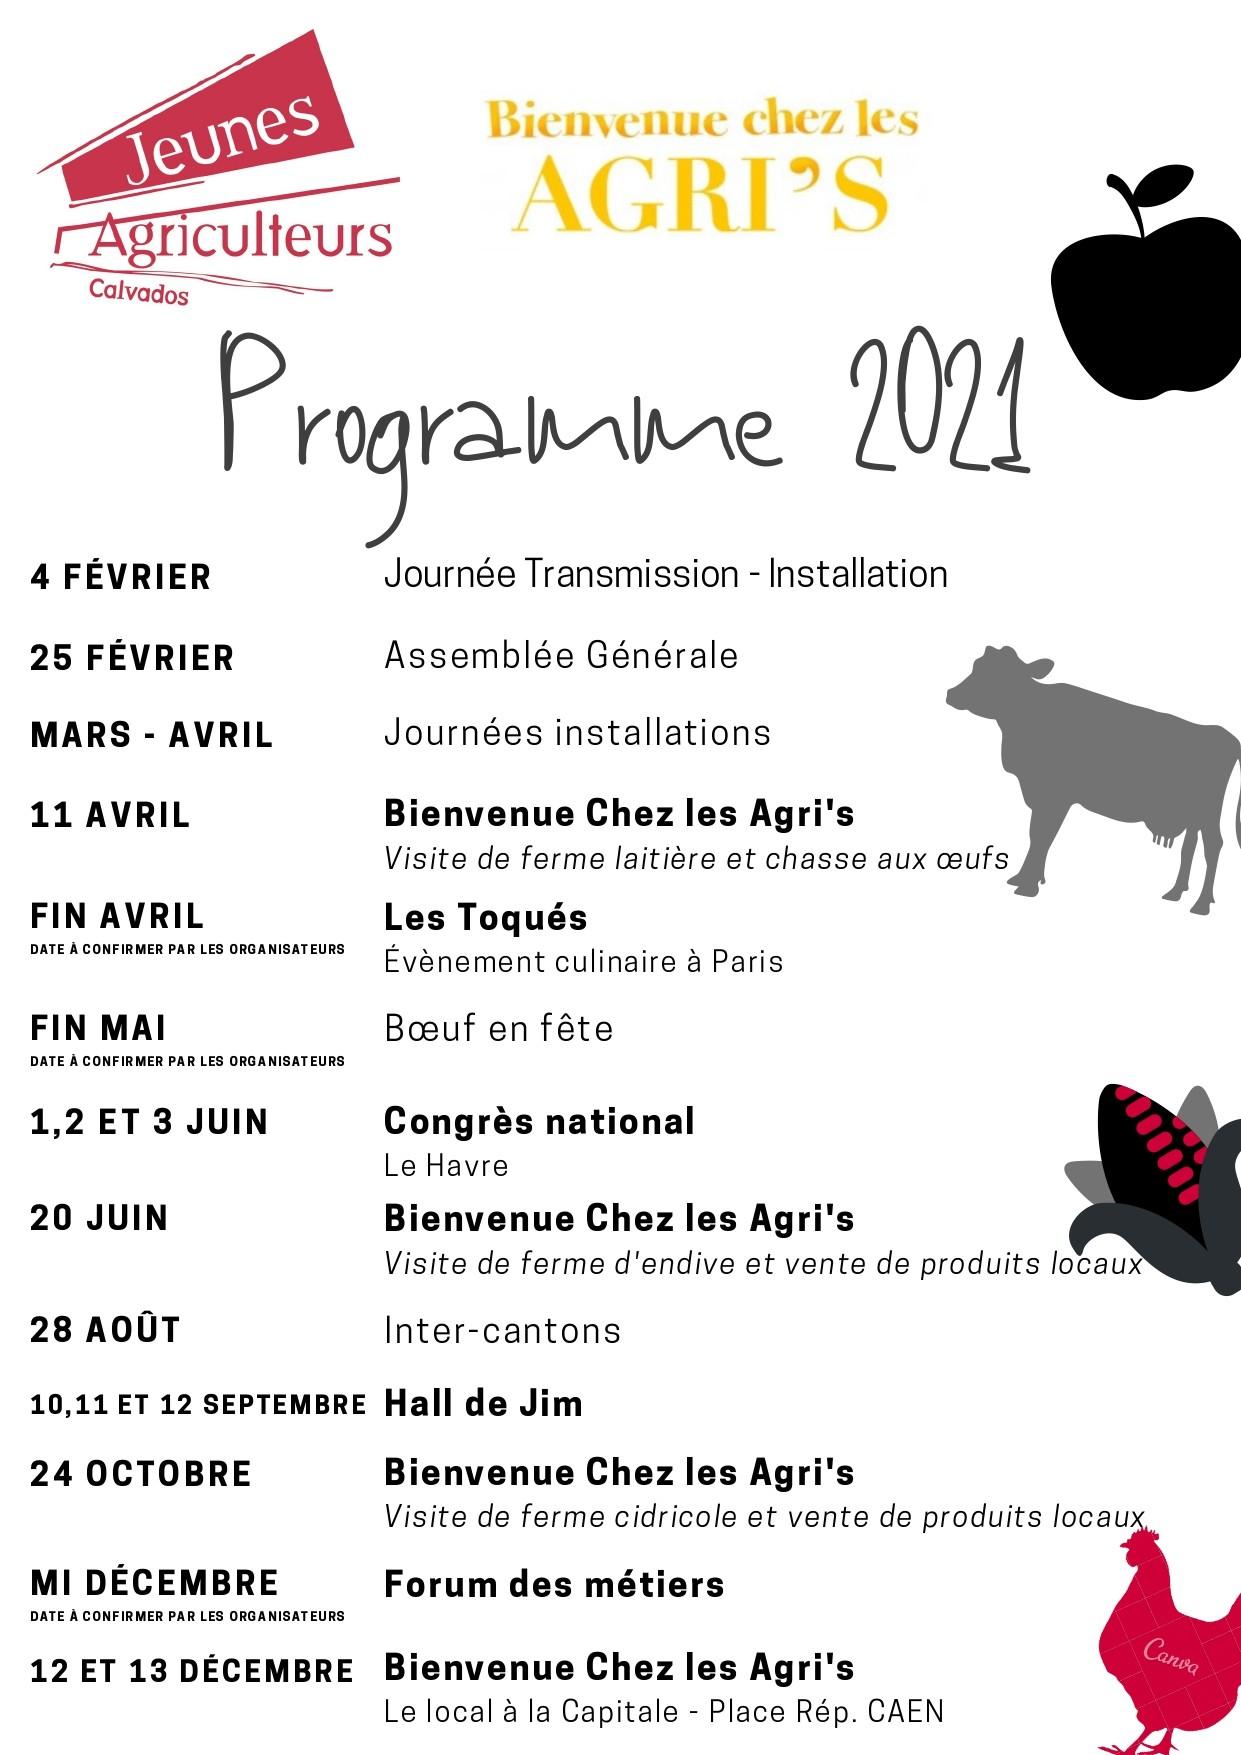 JA 14 - Programme 2021 - Jeunes Agriculteurs du Calvados